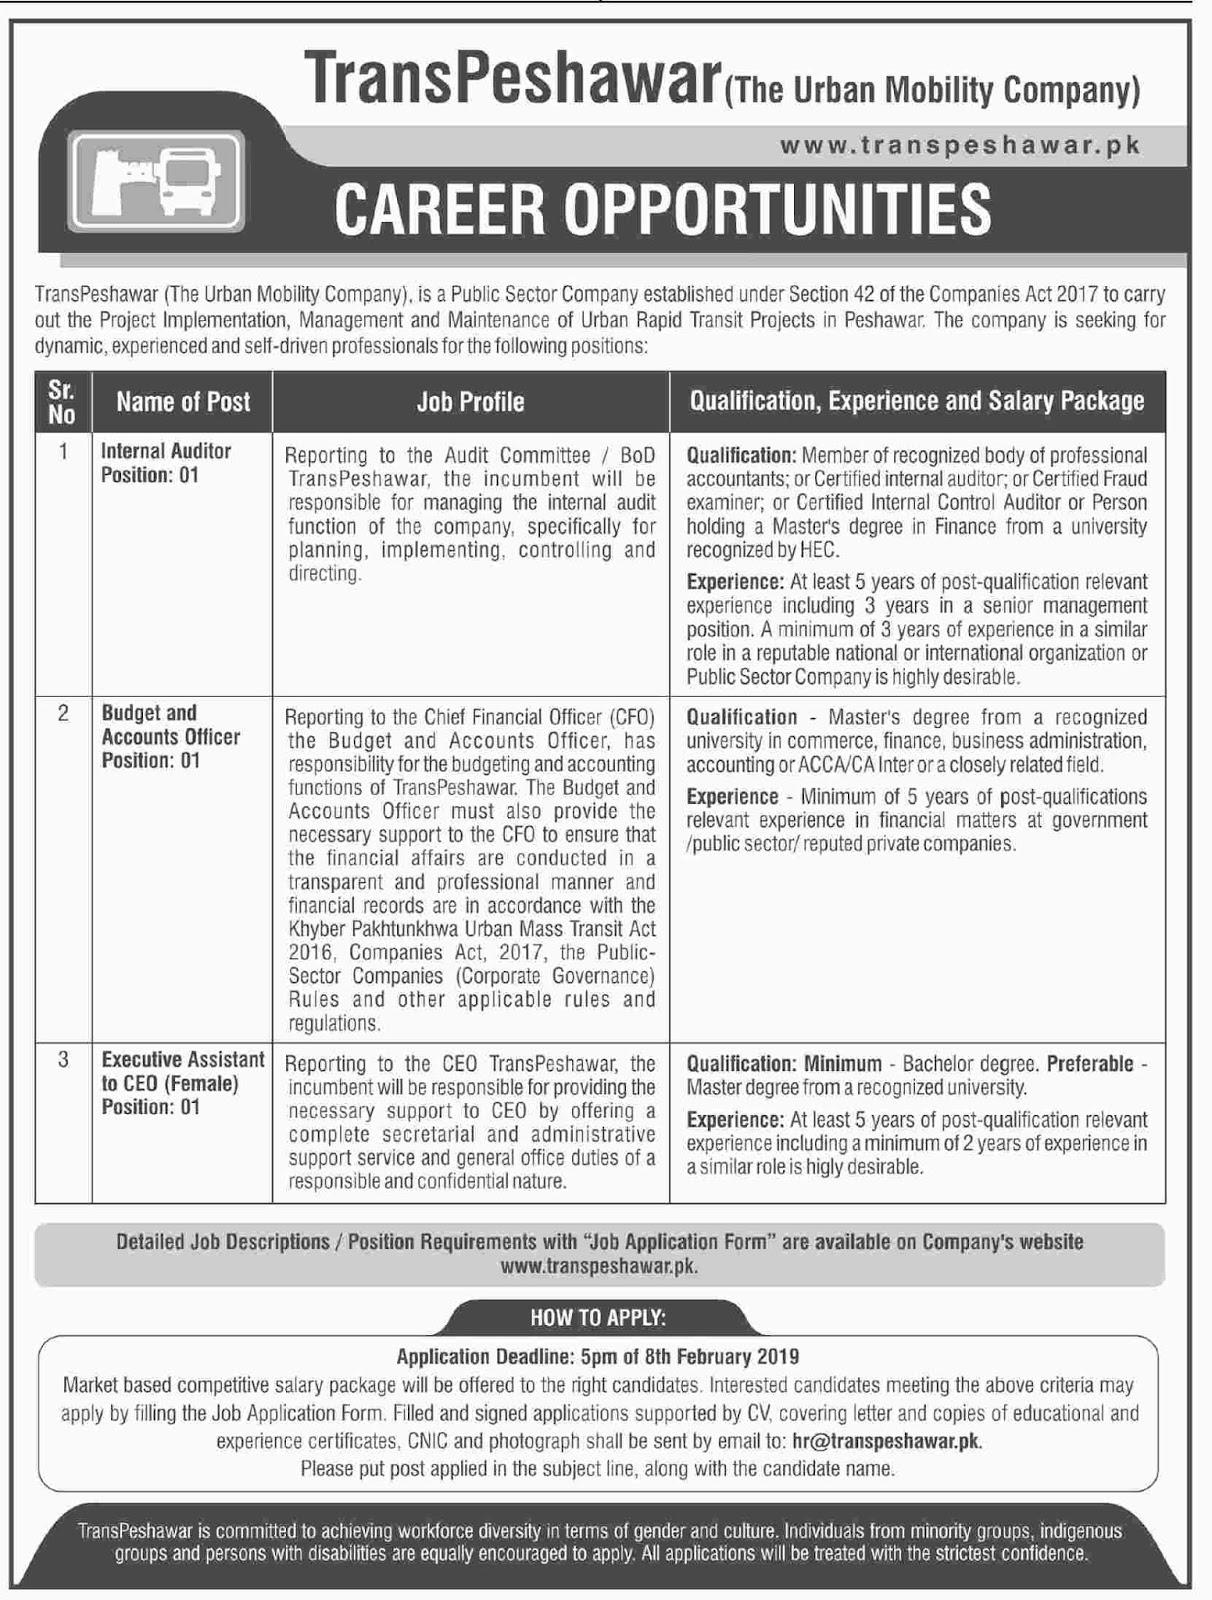 Jobs Vacancies In Trans Peshawar The Urban Mobility Company 24 January 2019